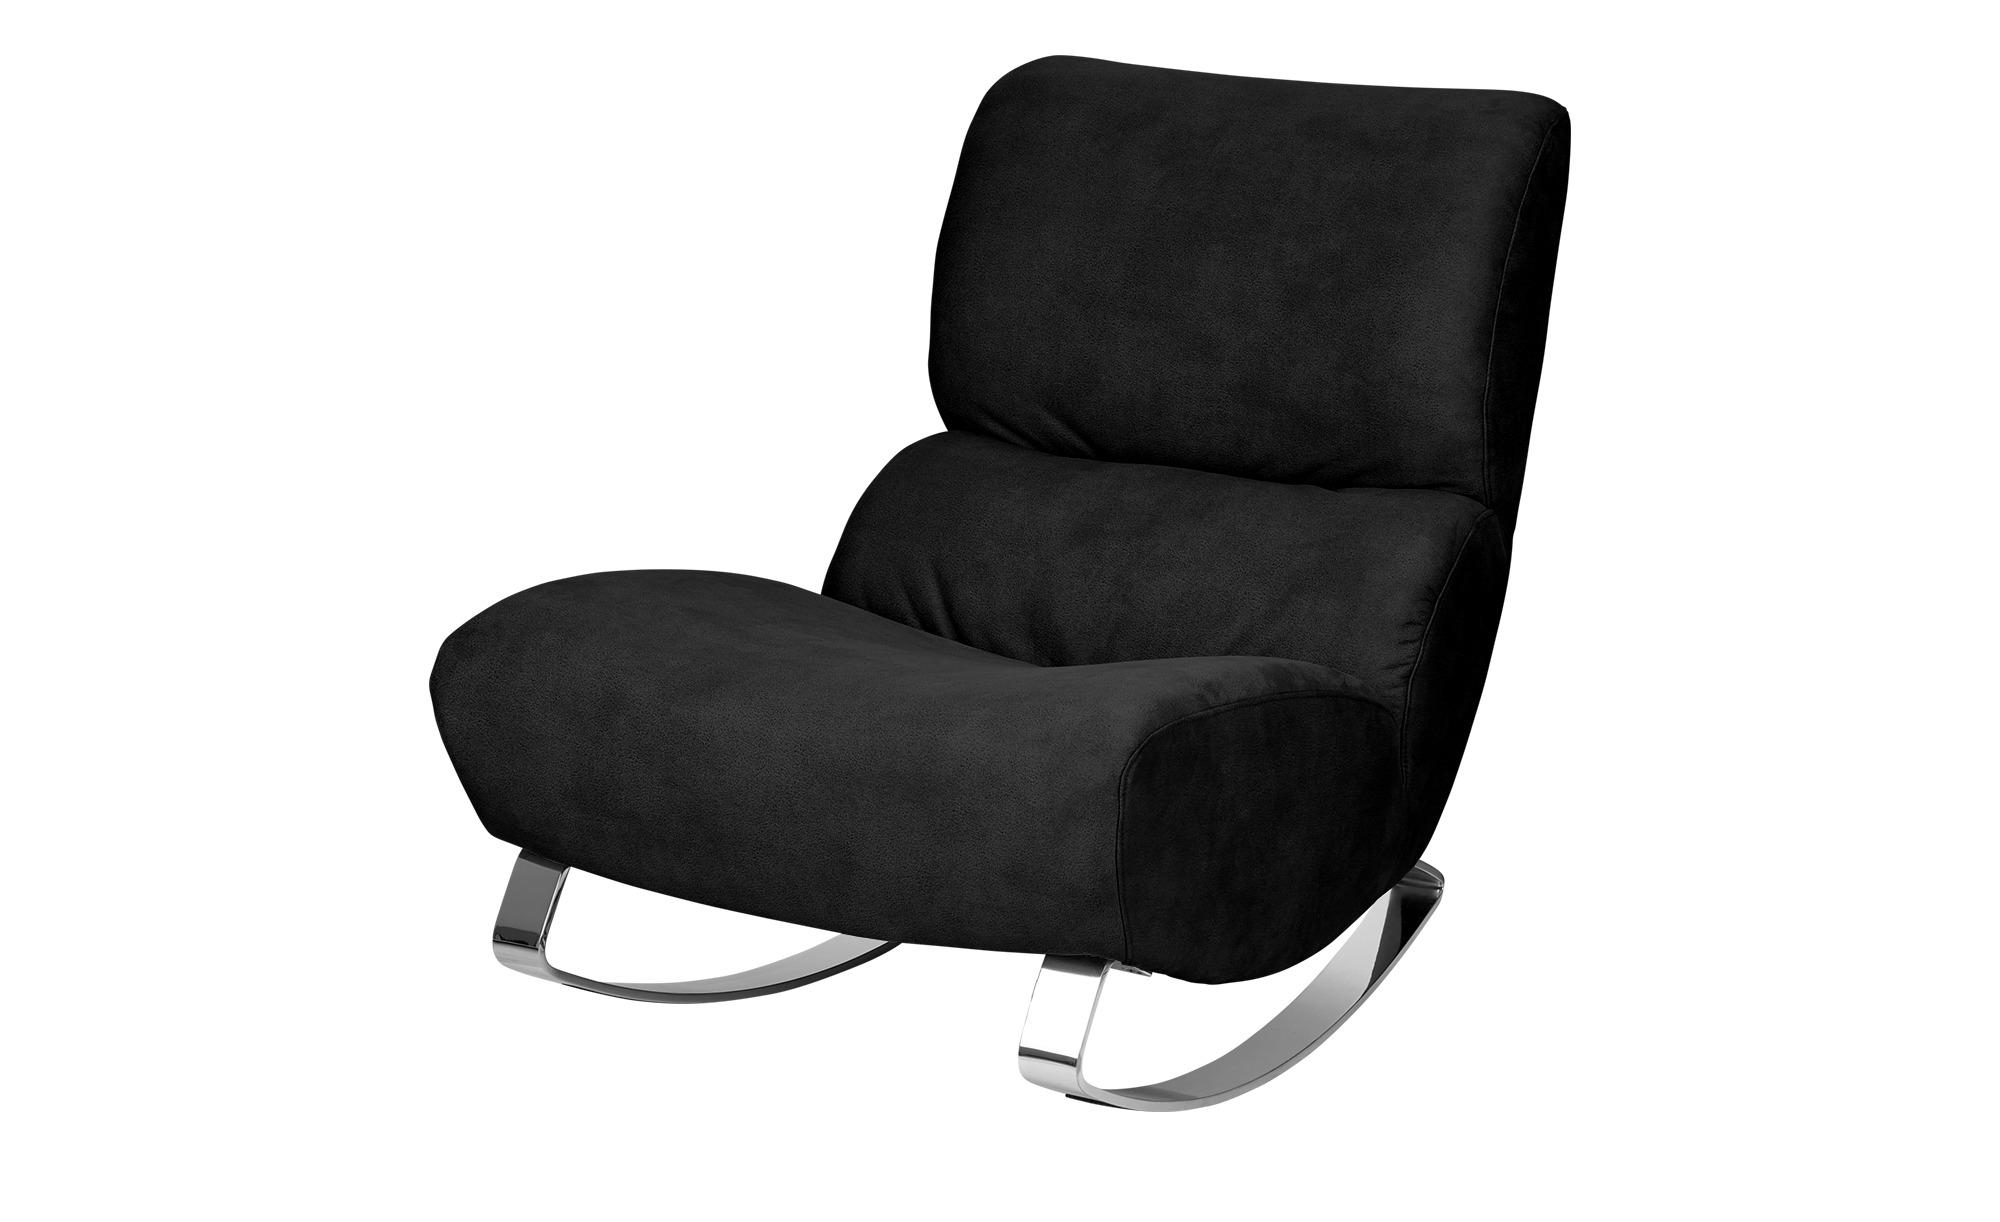 Design-Sessel schwarz - Stoff Citole ¦ schwarz ¦ Maße (cm): B: 76 H: 90 T: 103 Polstermöbel > Sessel > Polstersessel - Höffner